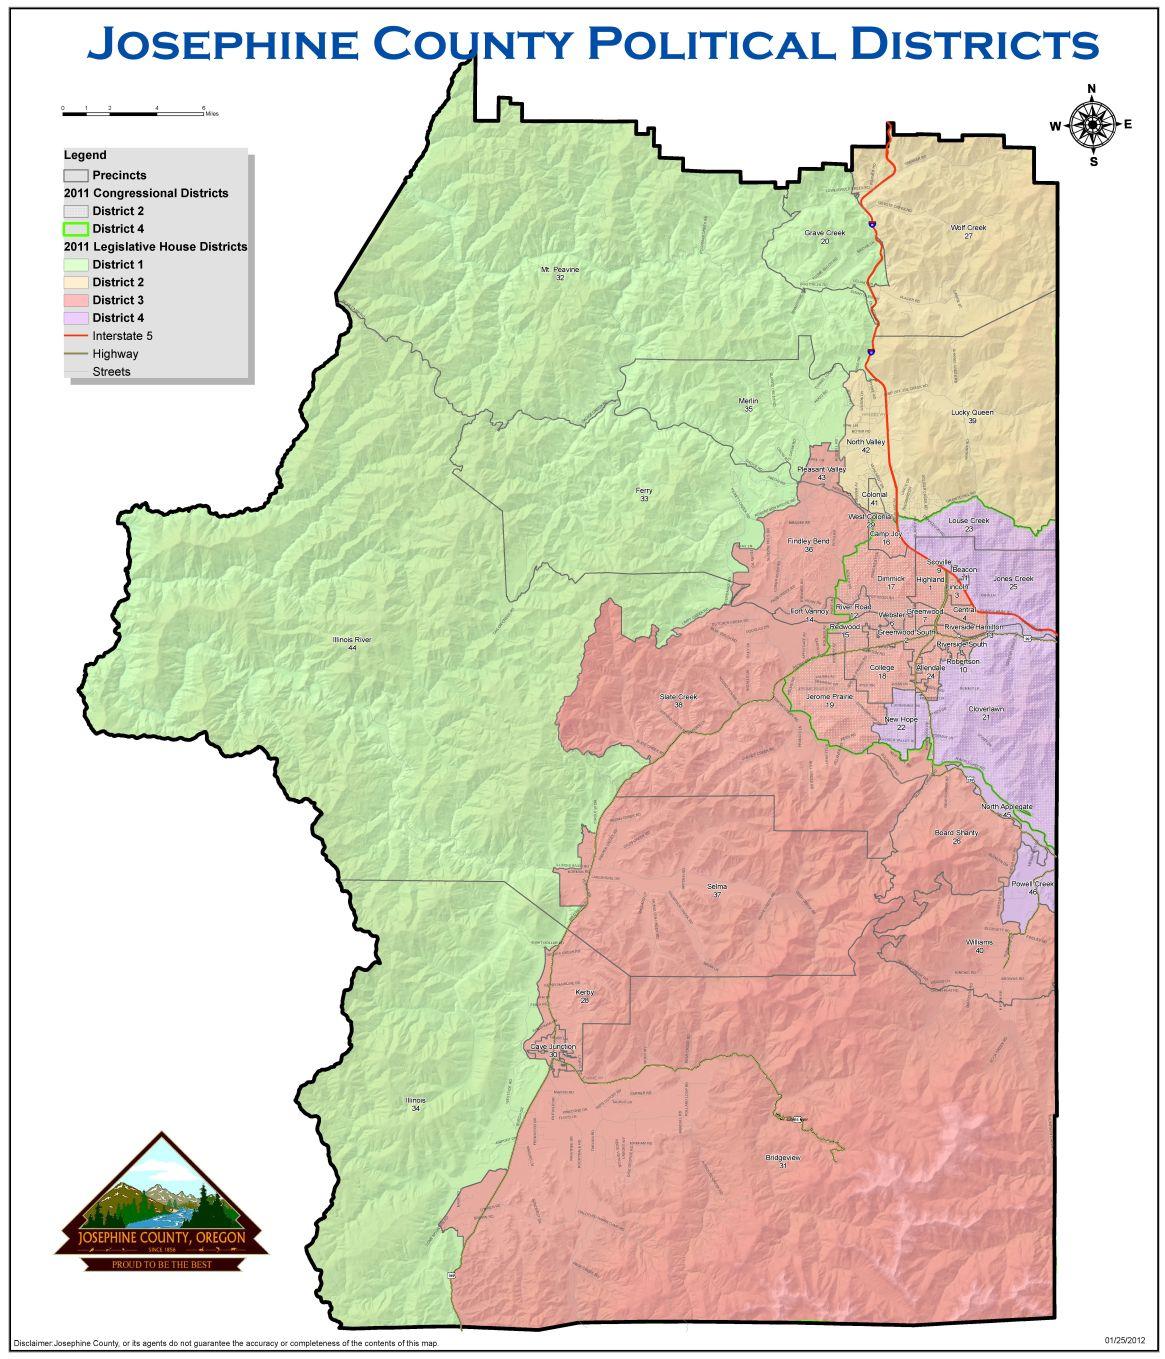 Josephine County Precinct Map